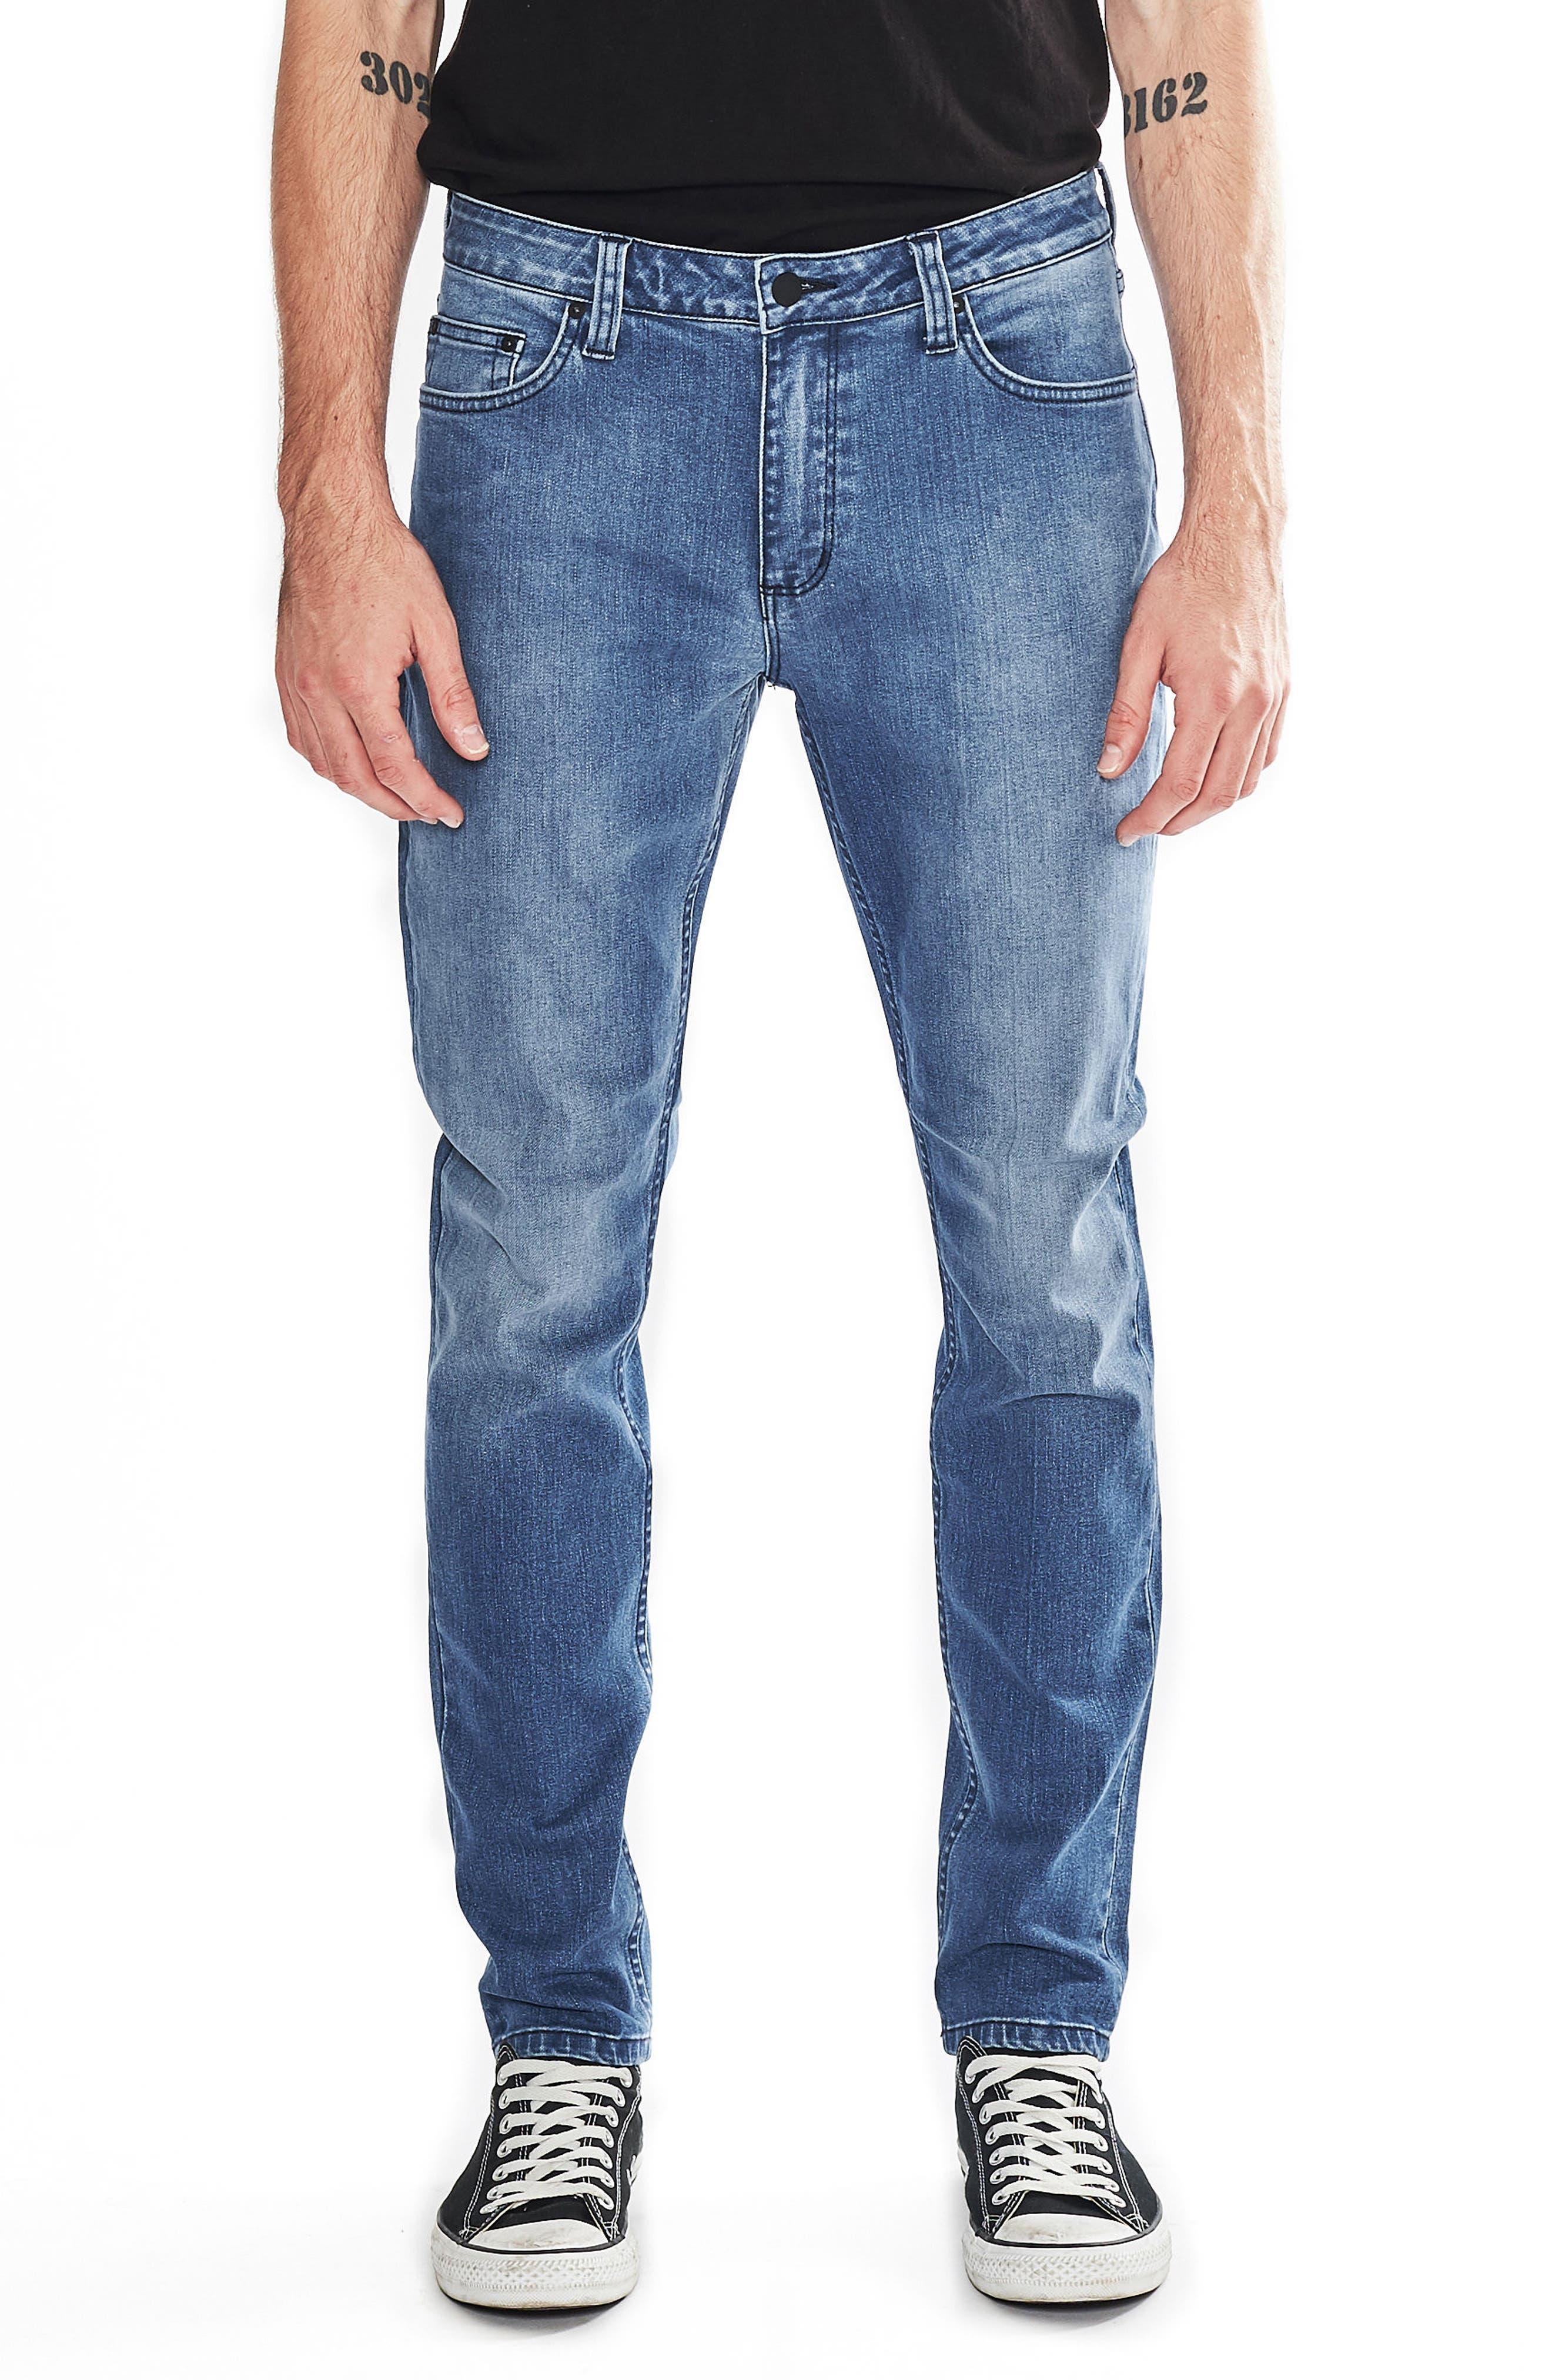 Tim Slims Slim Fit Jeans,                         Main,                         color, Safety Beach Blue